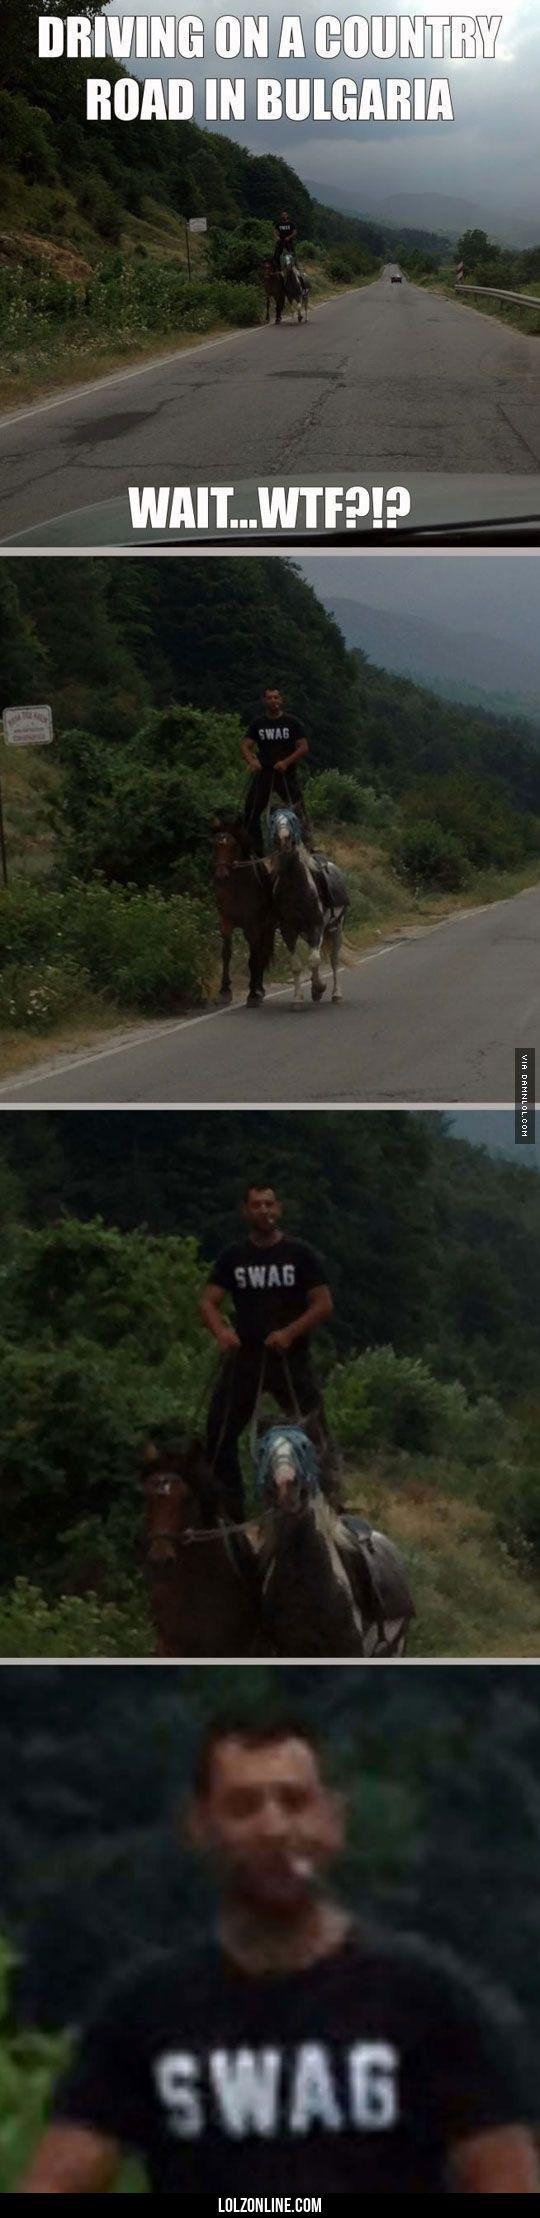 Bulgarian Swag#funny #lol #lolzonline